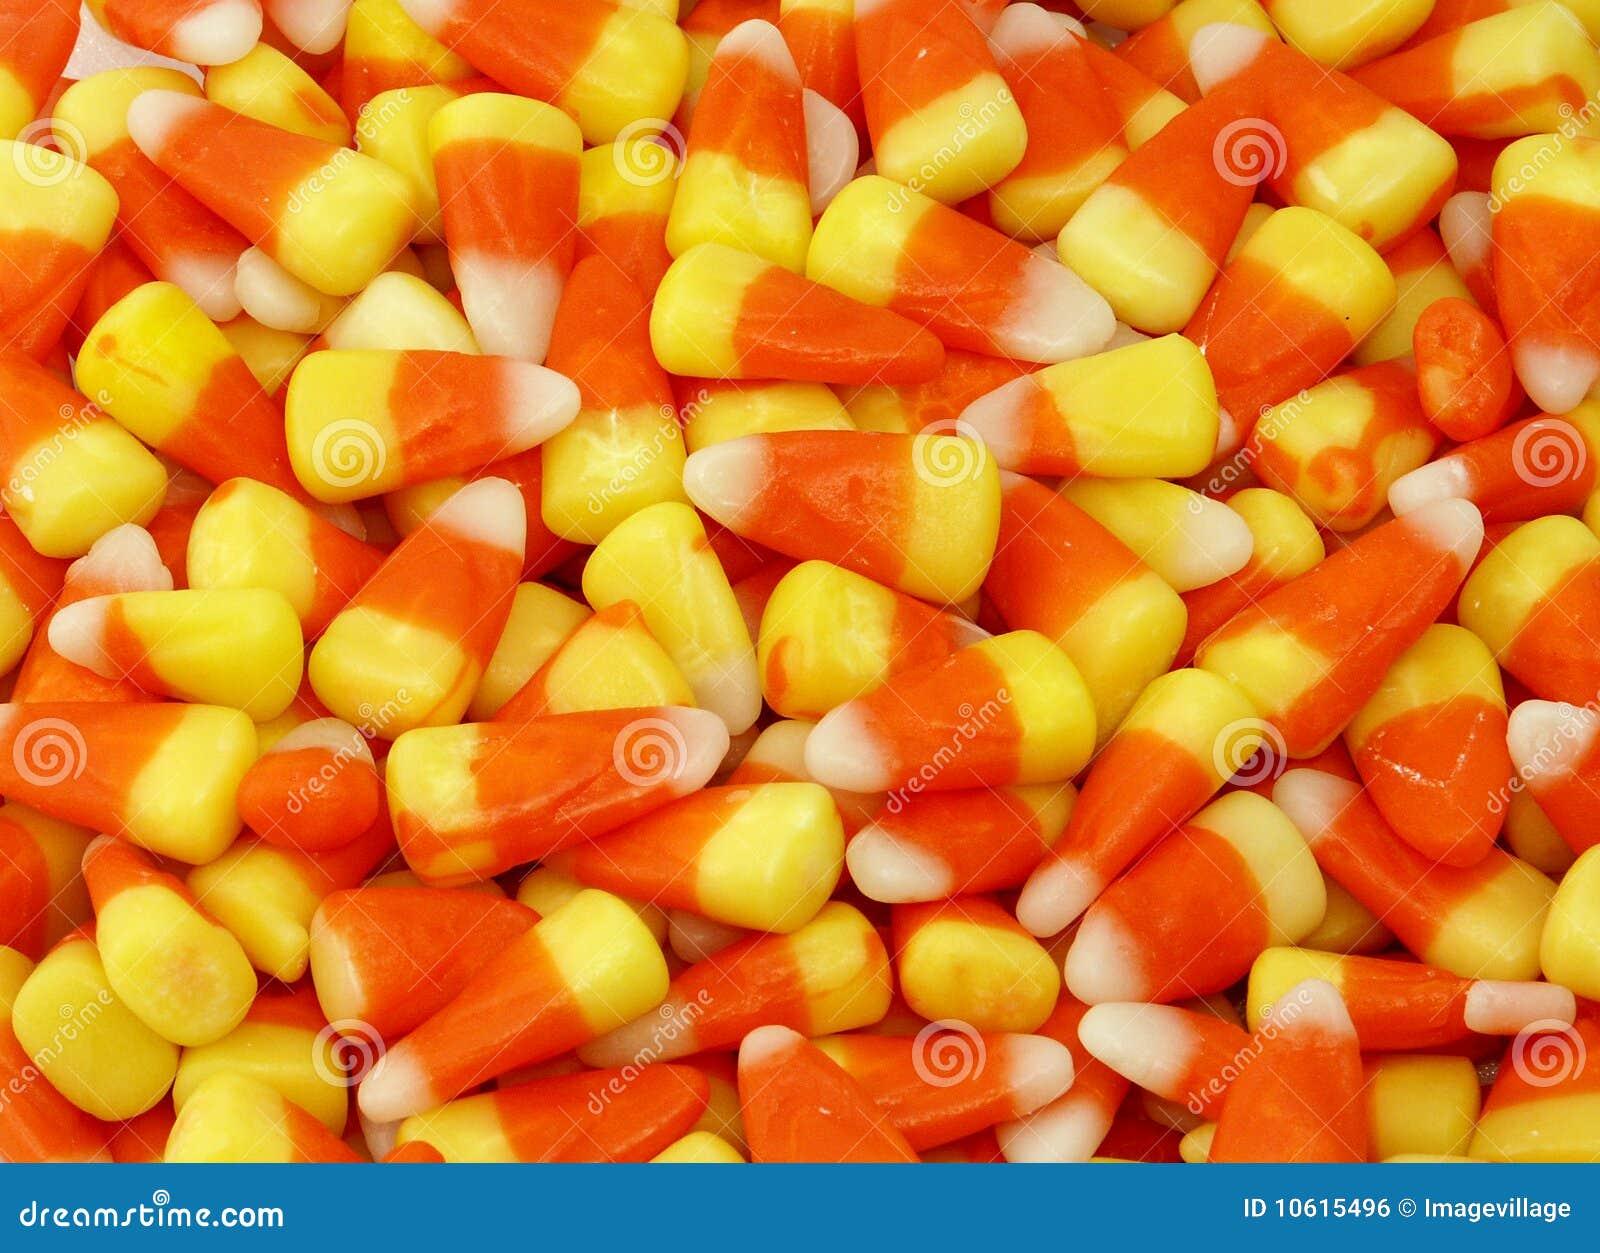 candy corn background royalty free stock image image